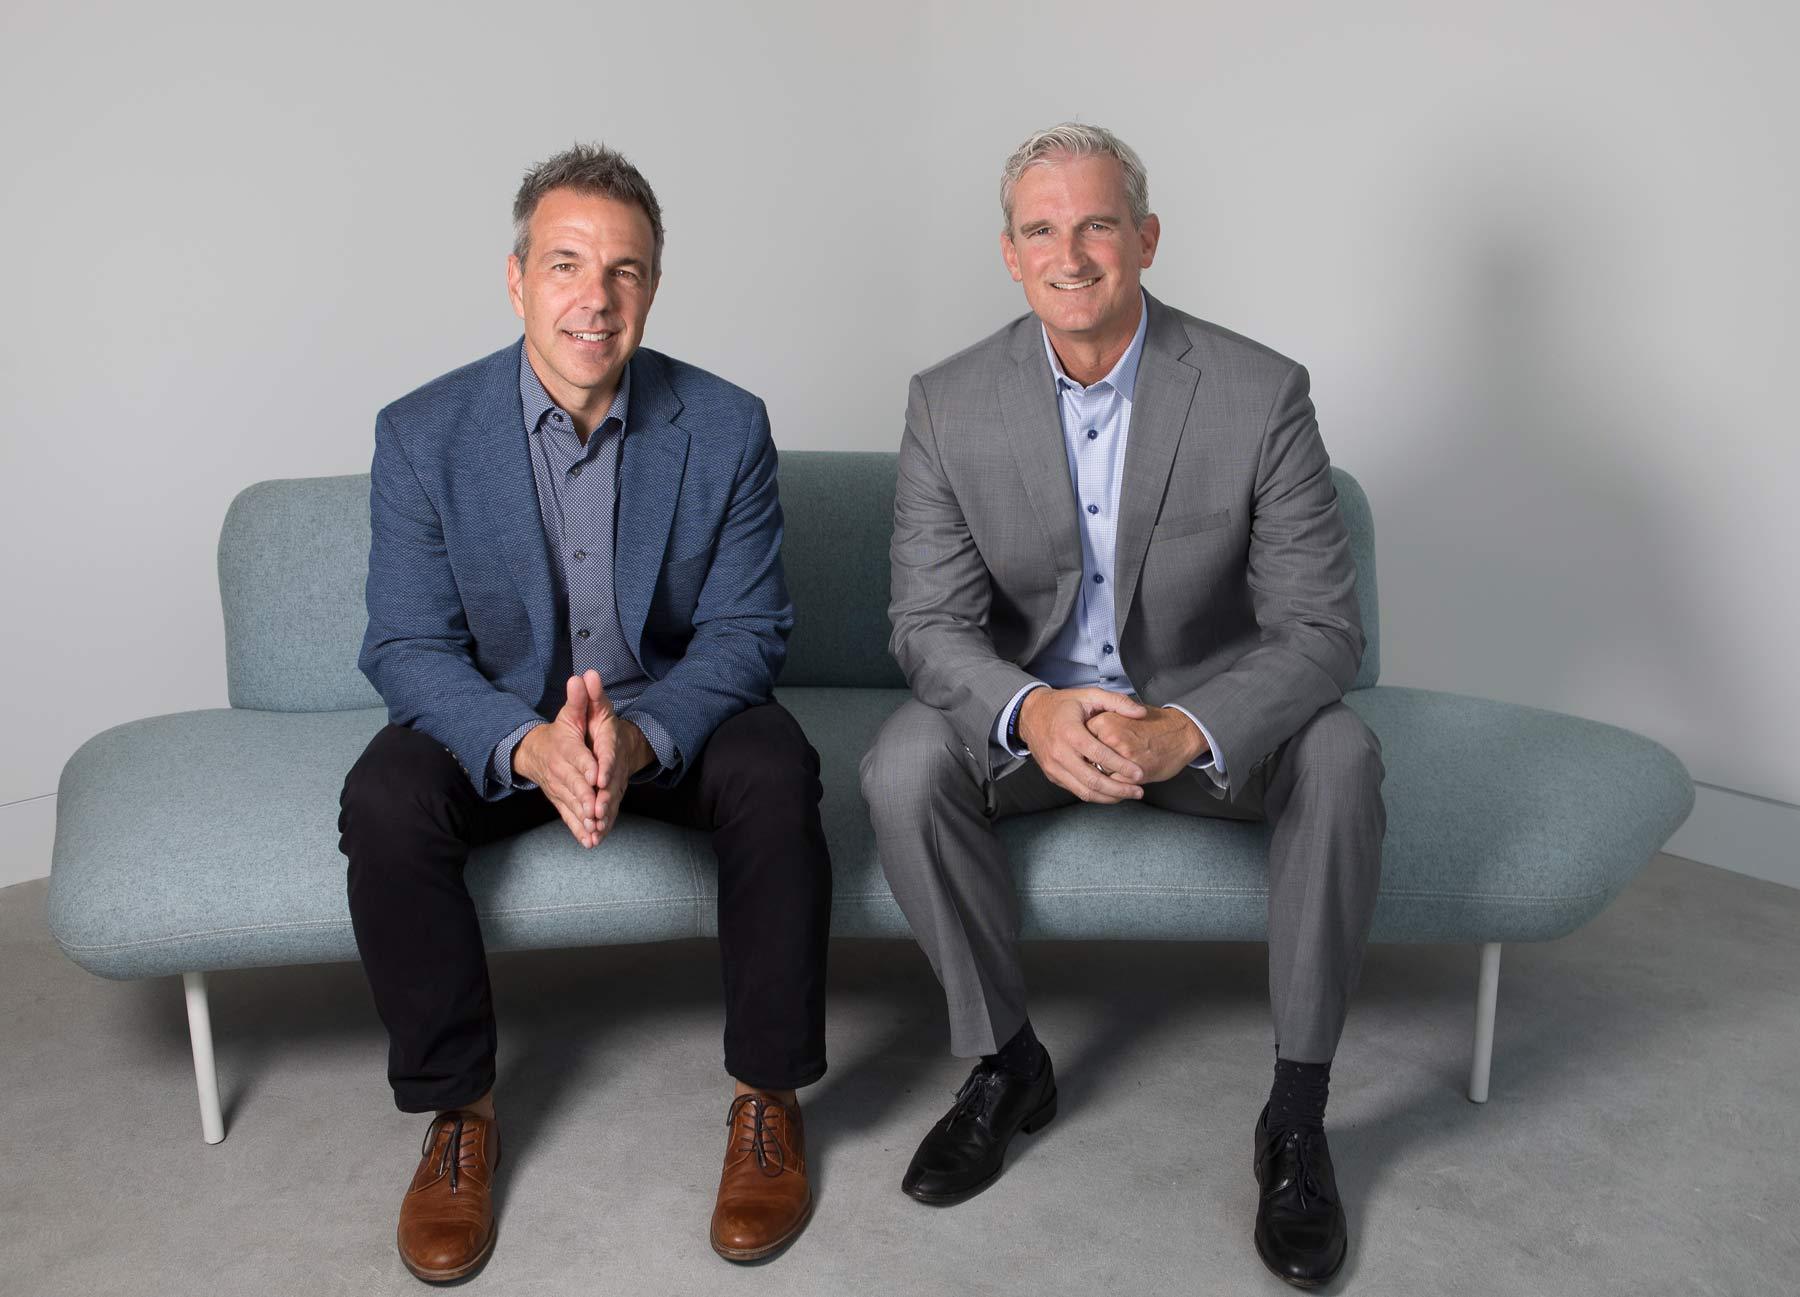 Jeffrey Braun, Executive Vice President, Platform-U by Unisource Solutions; Rick Bartlett, President, Sales and Marketing, Unisource Solution